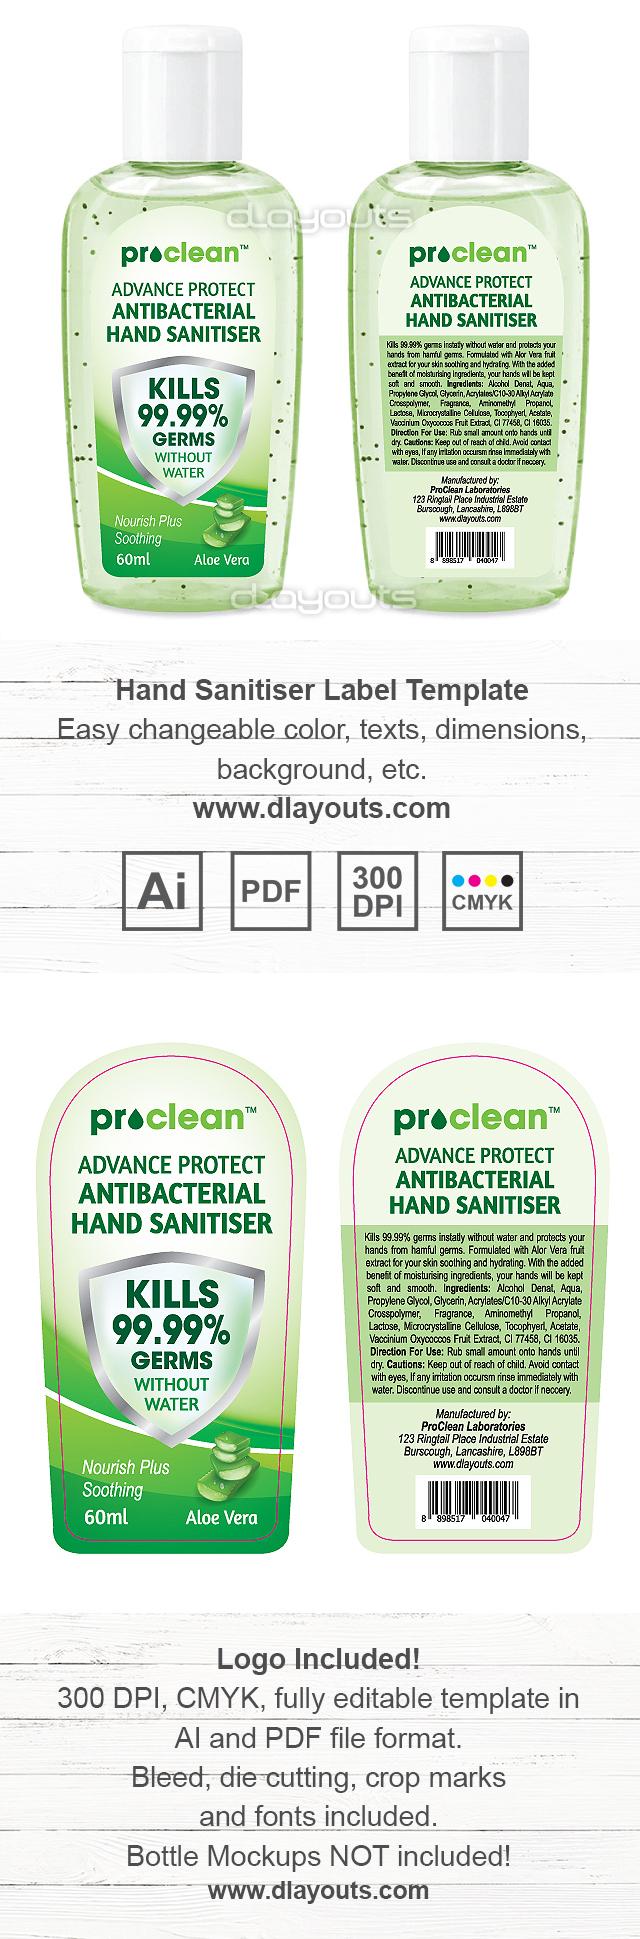 Hand Sanitizer Label Template